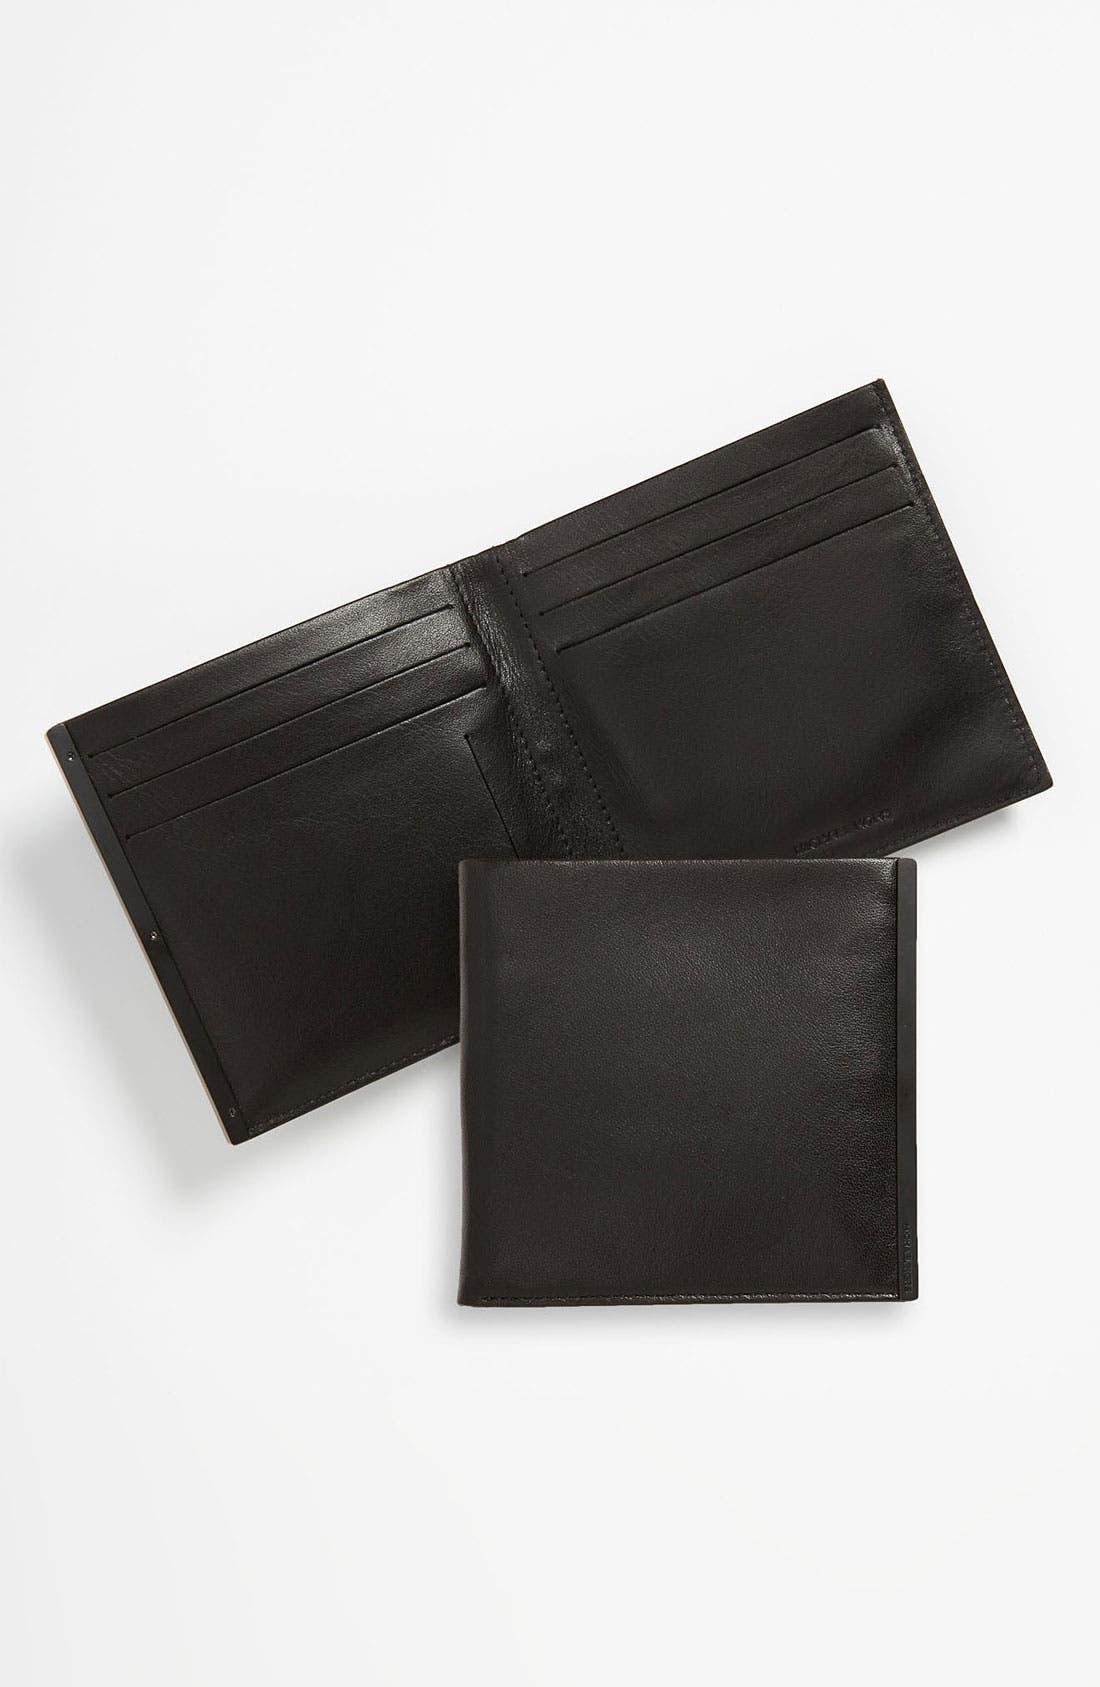 Alternate Image 1 Selected - Michael Kors Calfskin Leather Bifold Wallet